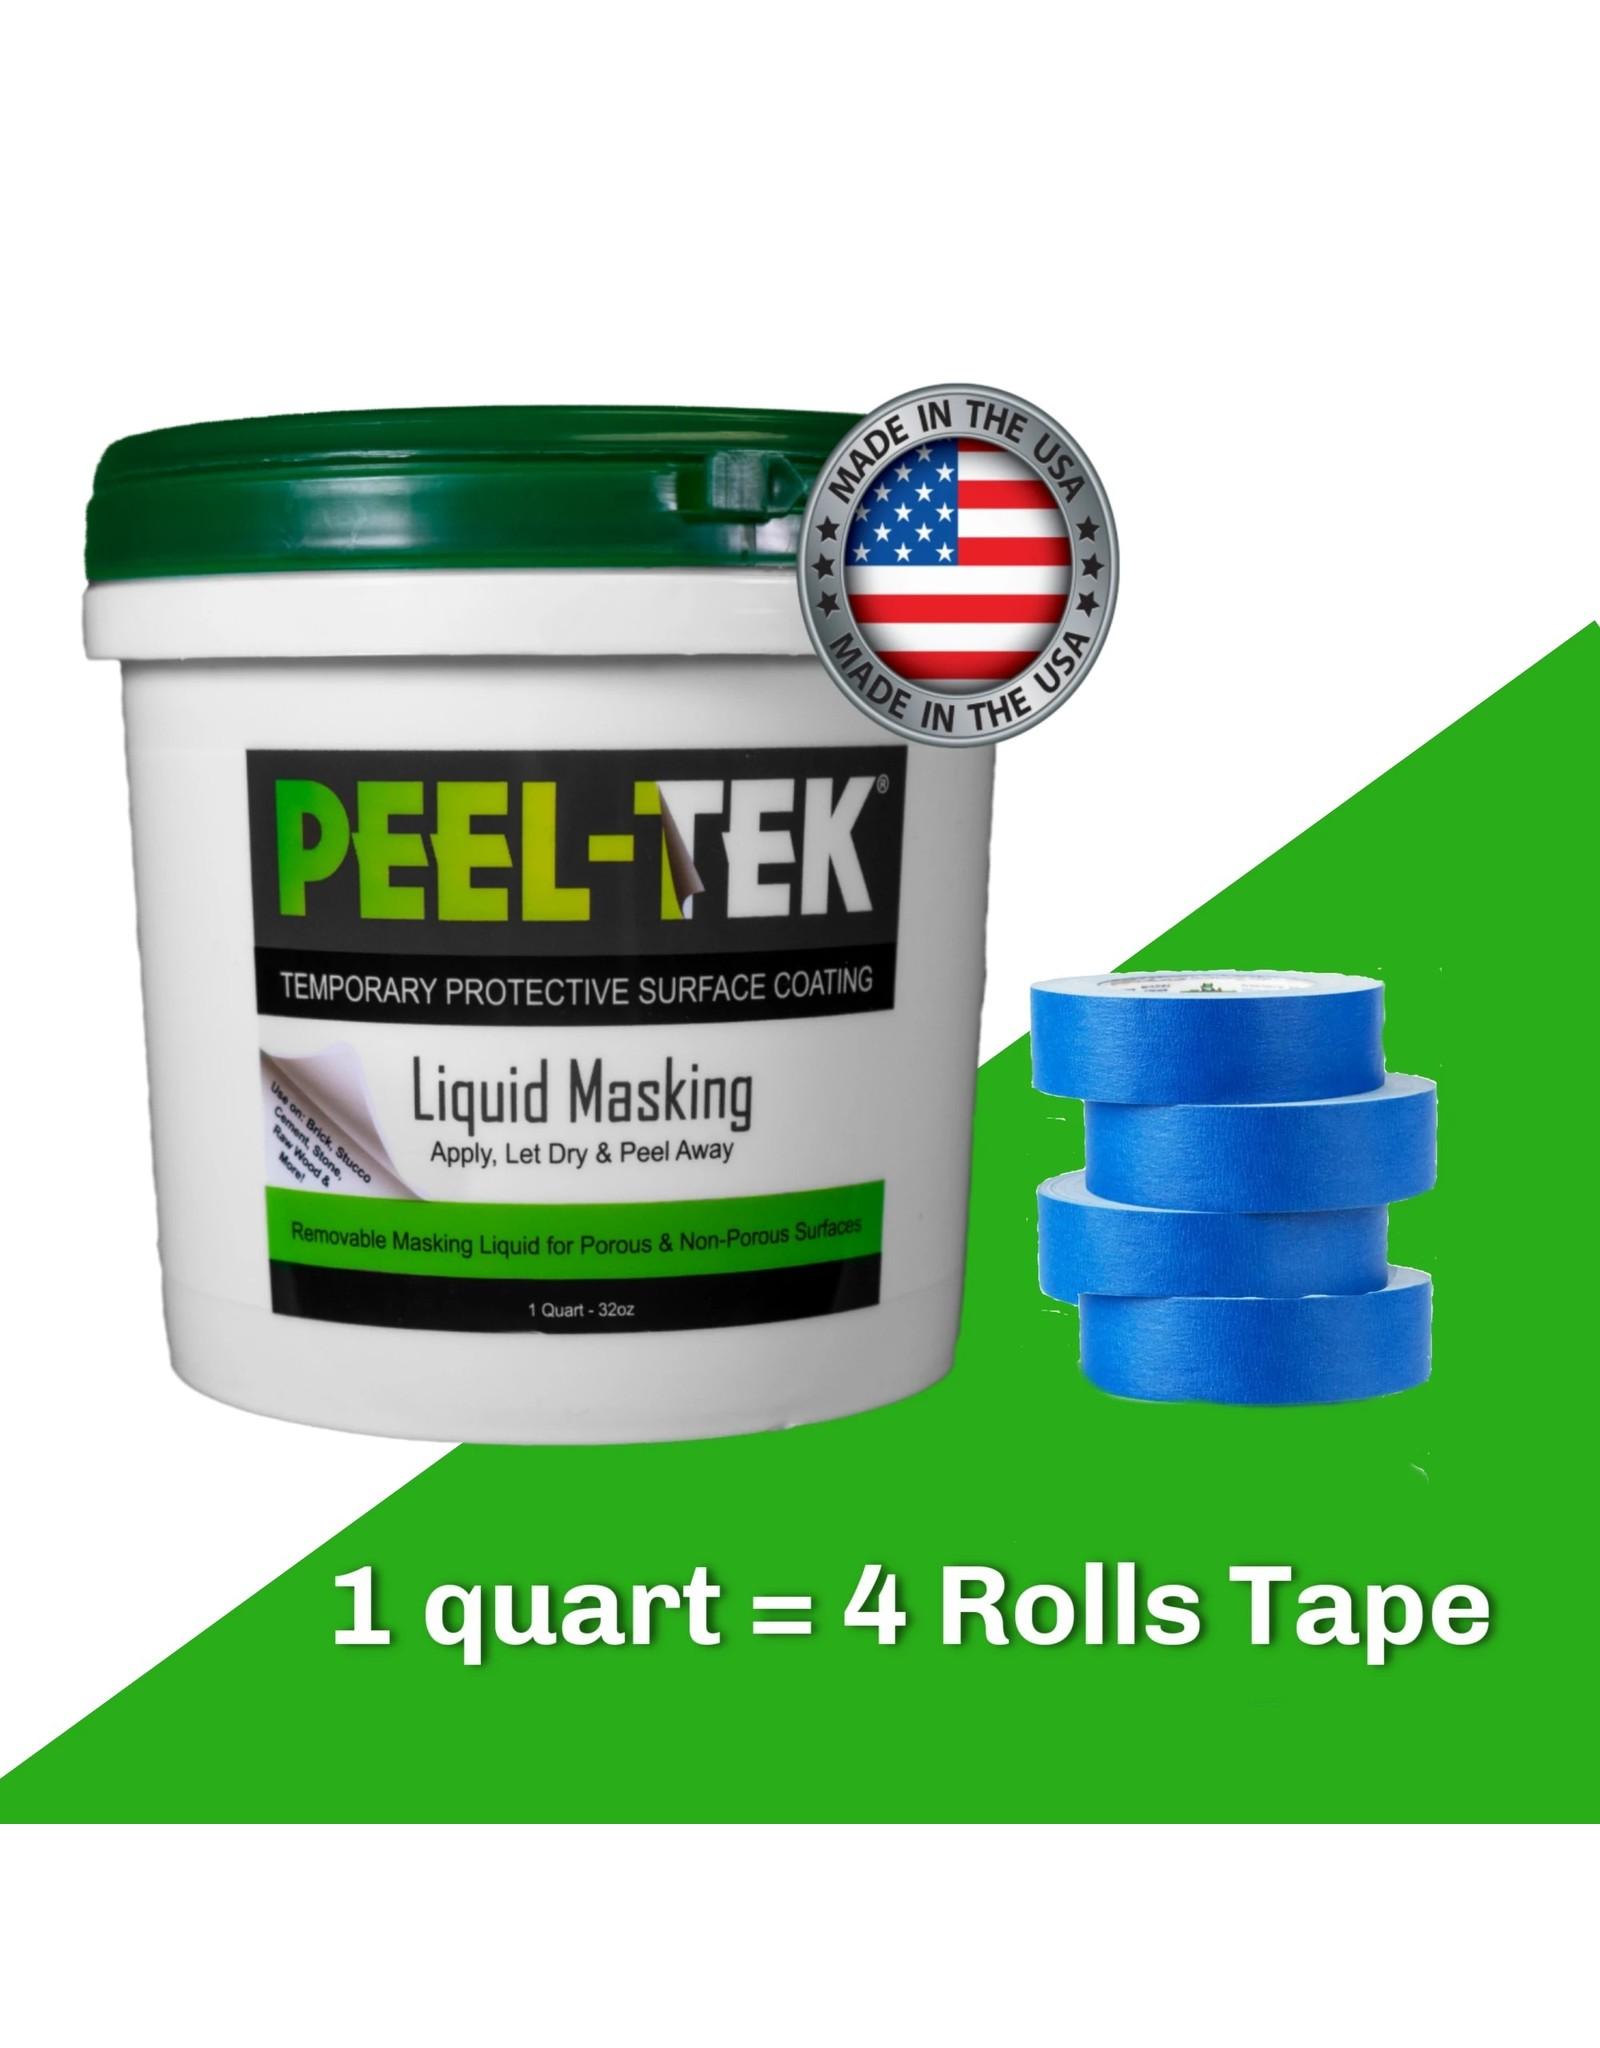 Peel-Tek Peel-Tek Liquid Mask - Quart